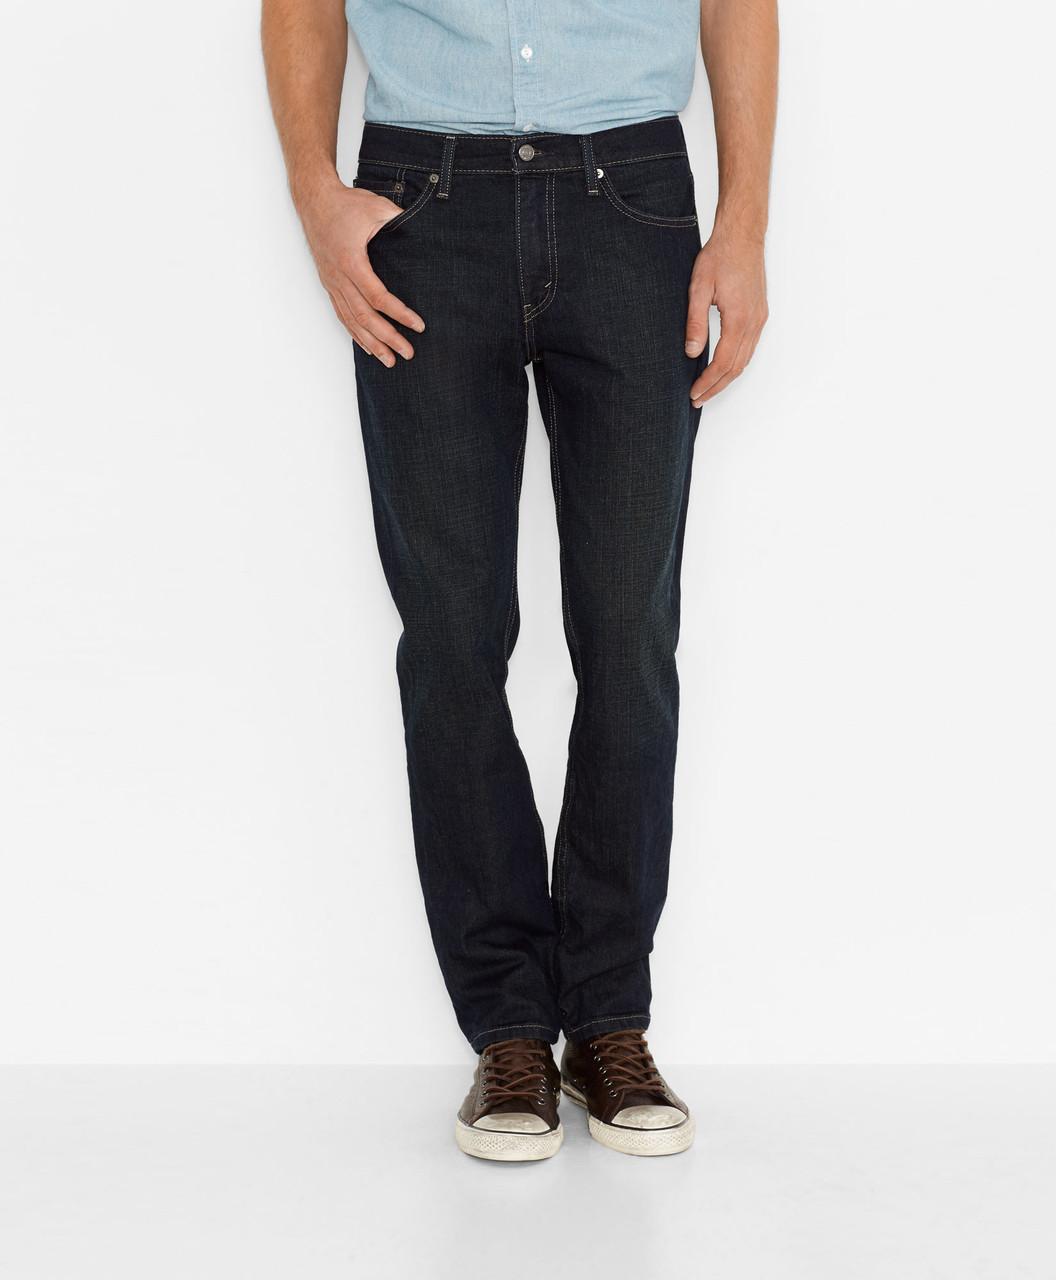 c234bcd44c2 Мужские джинсы Levis 511™ Slim Fit Jeans (Clean Dark) Черные - Интернет-